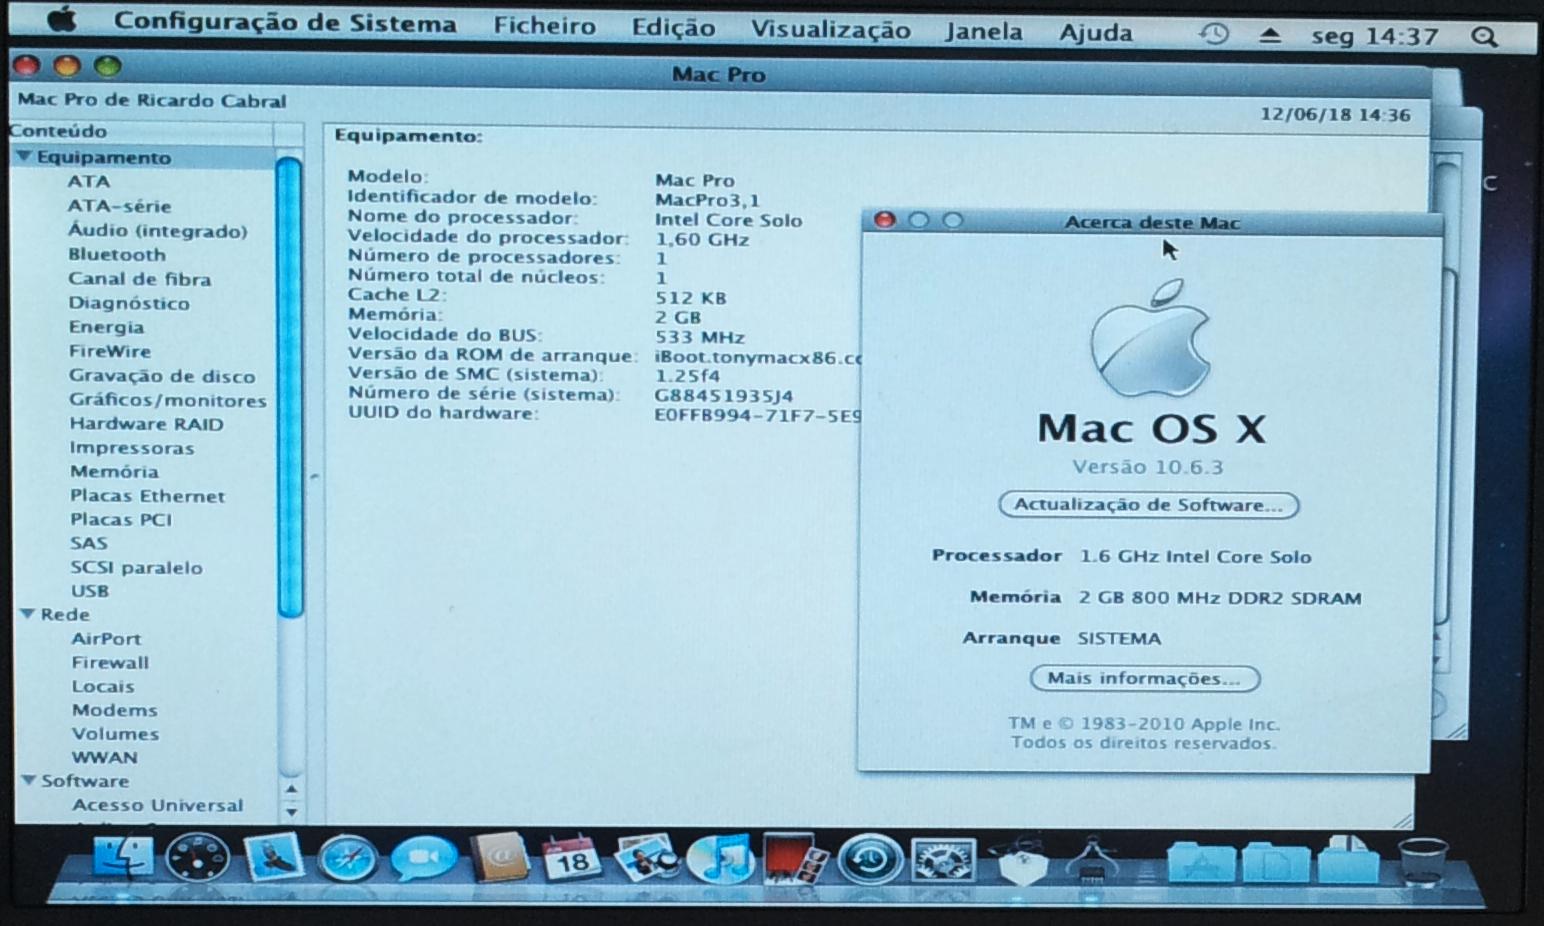 Iphone 6 et <b>mac</b> <b>OS</b> X <b>10.6</b>. <b>8</b> + <b>itunes</b> 11.4